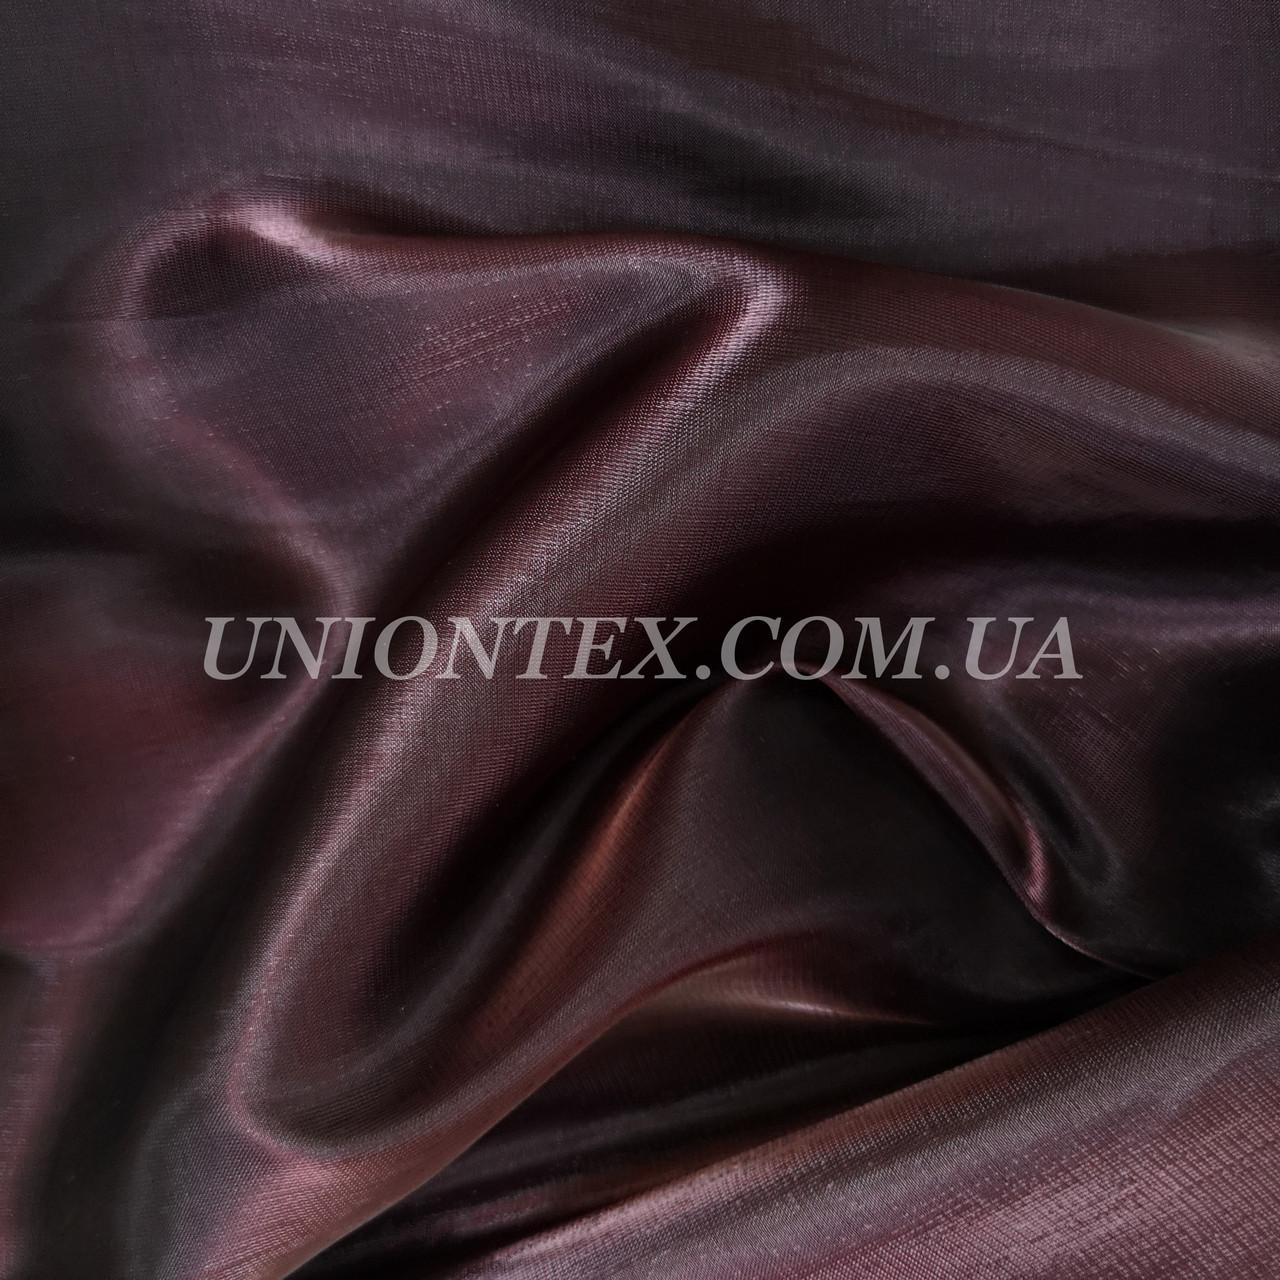 Ткань органза марсала